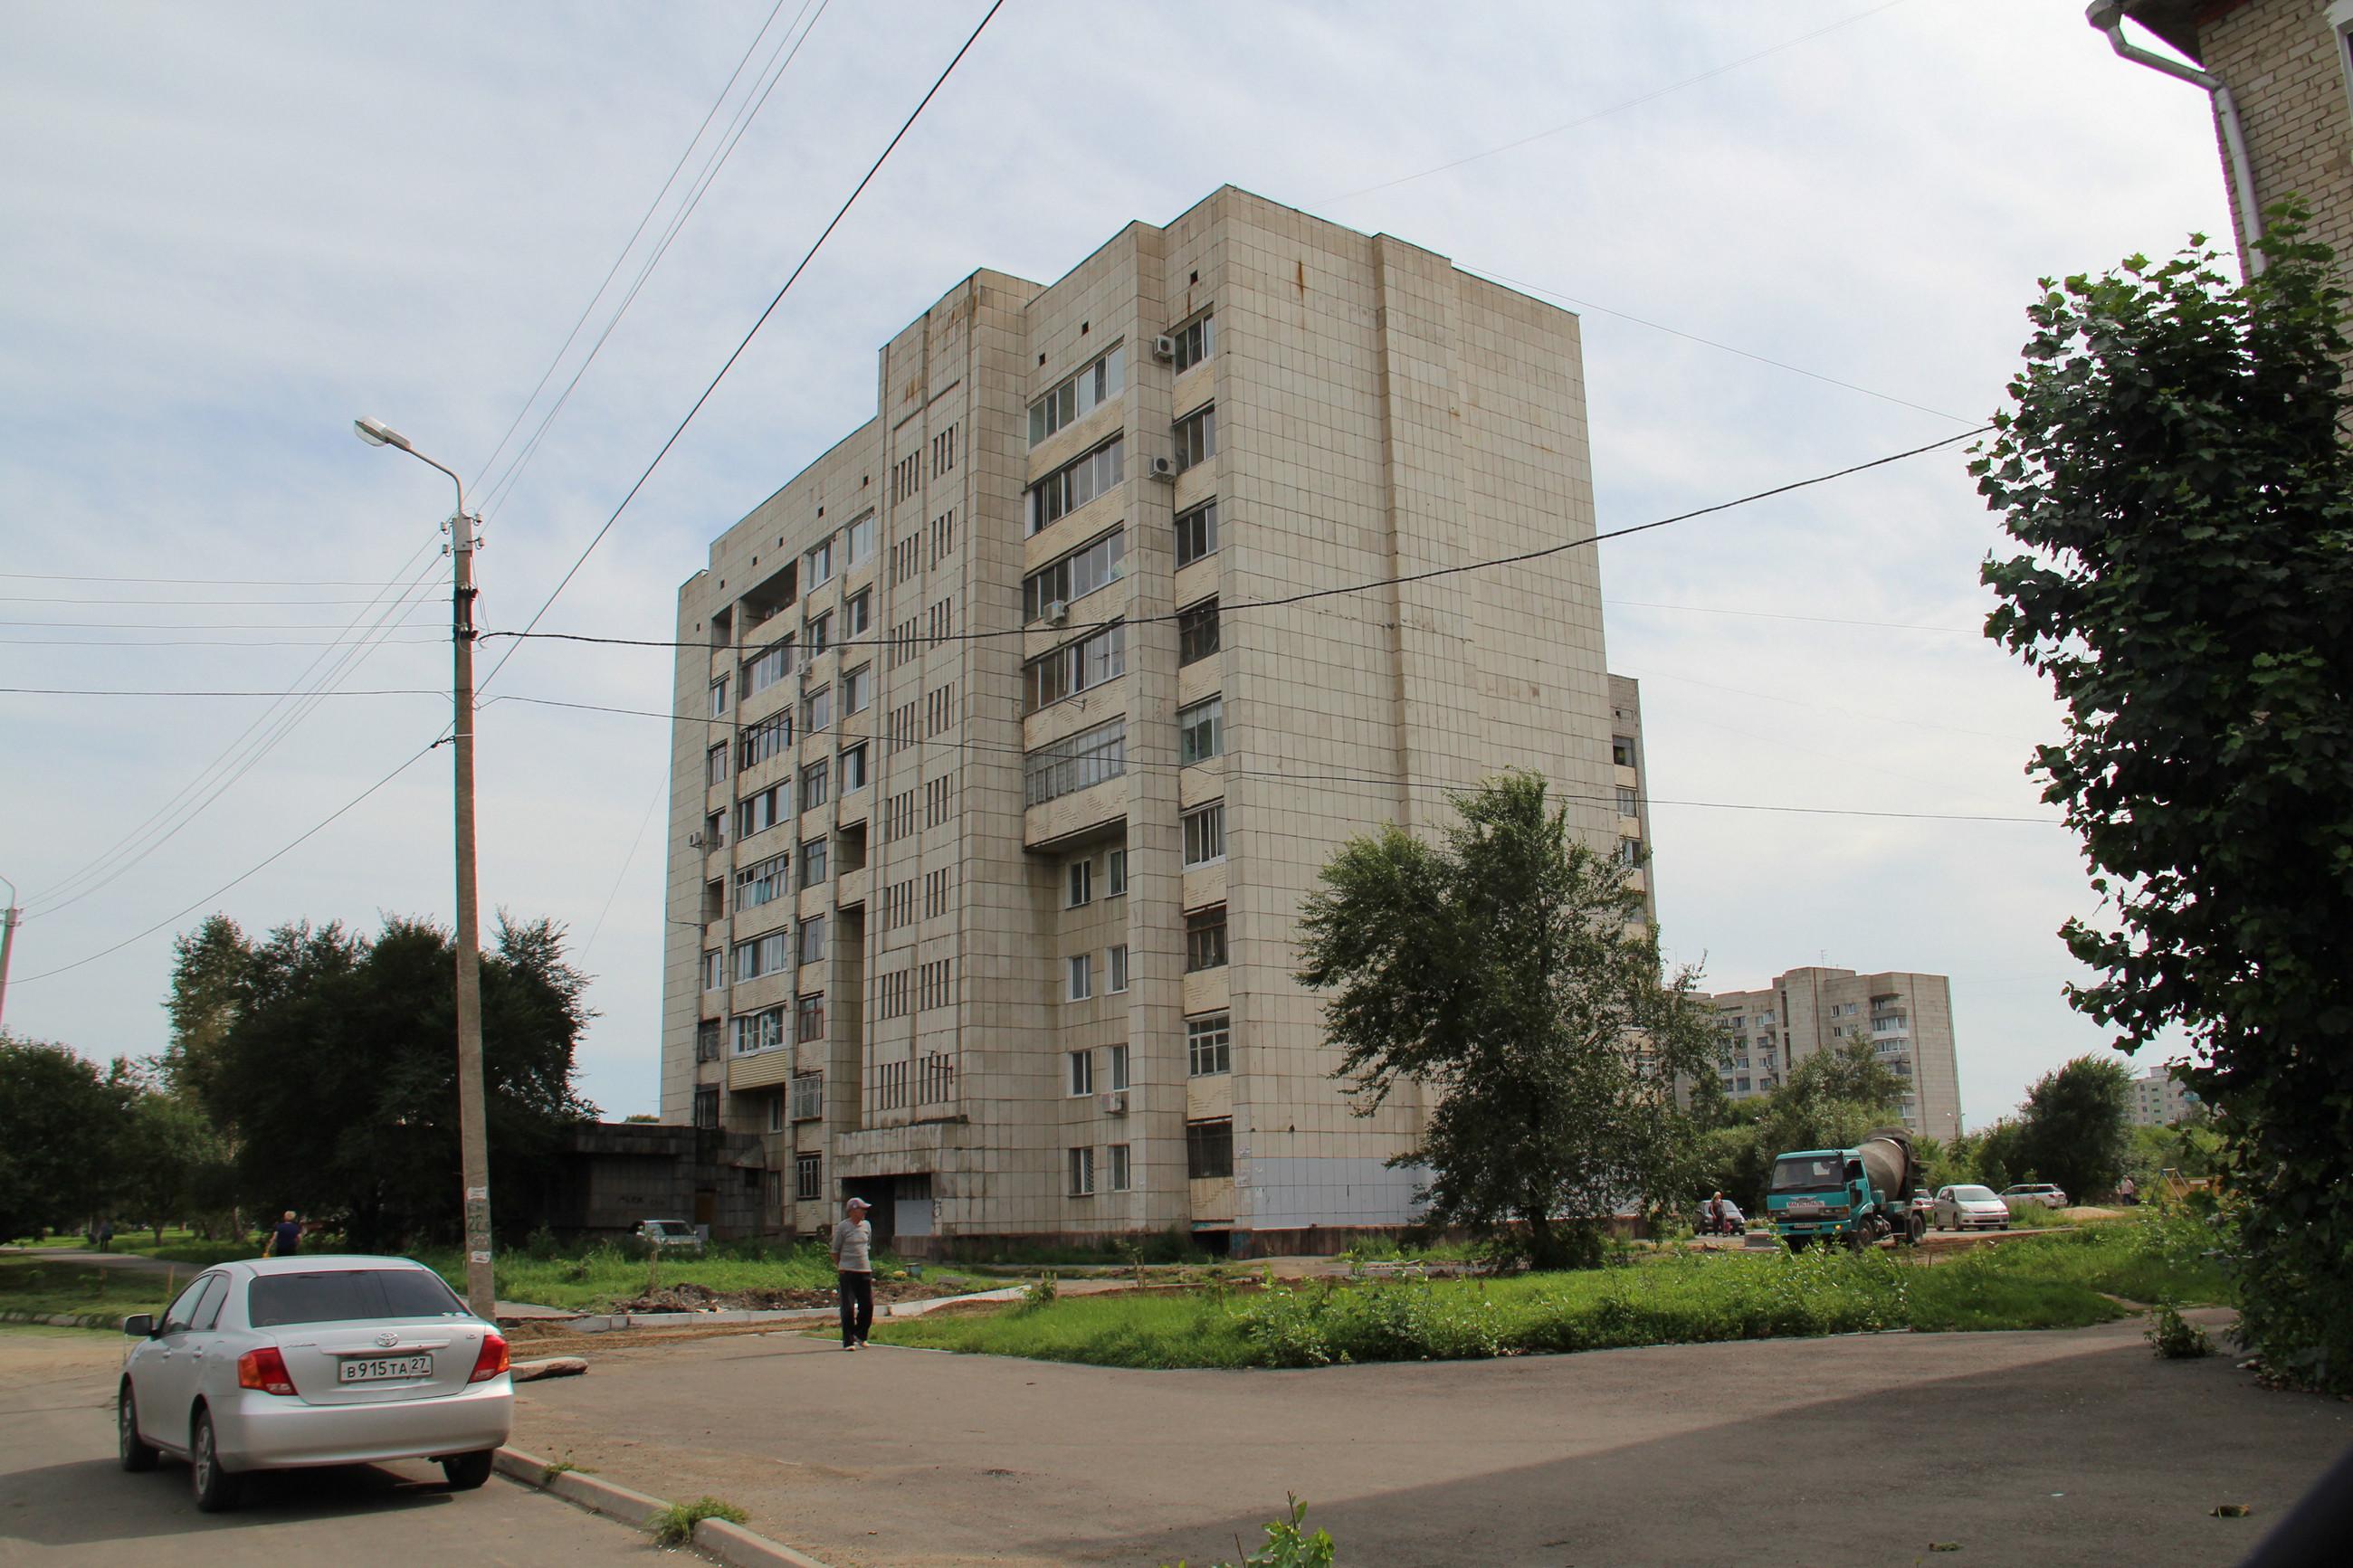 Комсомольск-на-Амуре, 2016